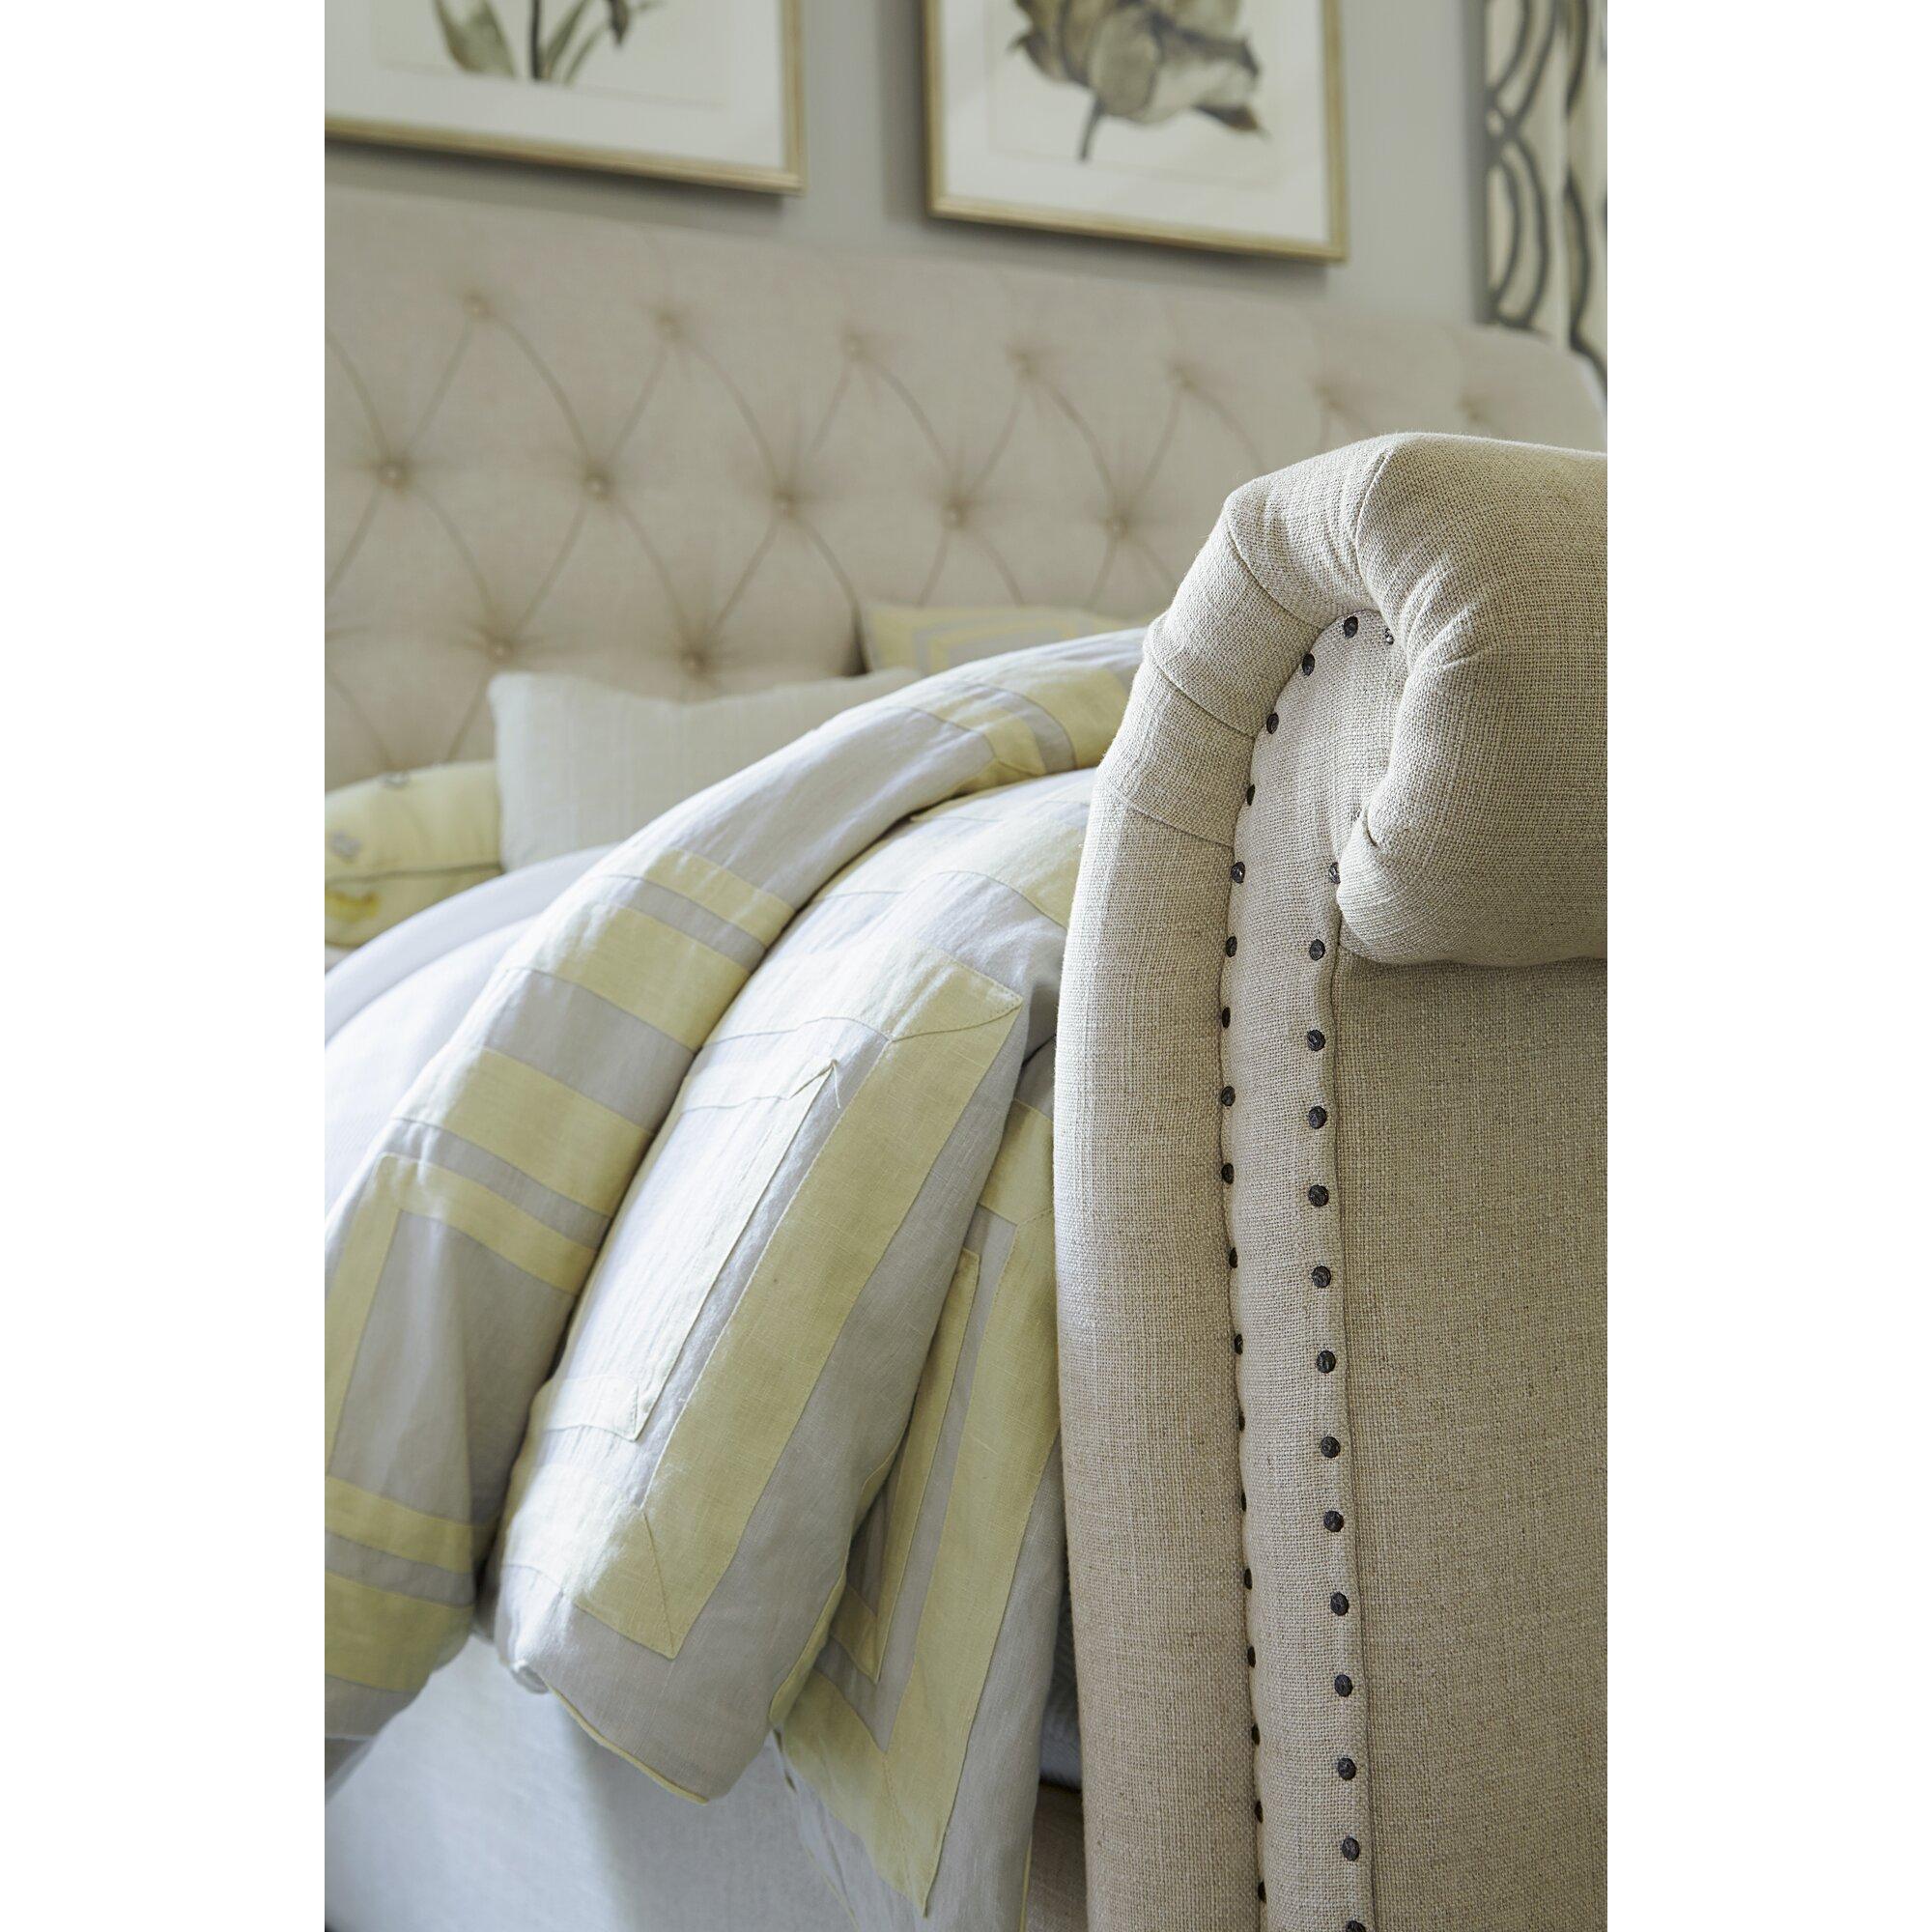 Twin Unisex Nursery 1 further Universal Furniture New Bohemian Sleigh Bed 45075B 45076B UNI4044 besides Dorm Room additionally Best Home Decorating Ideas additionally Meiden Tiener Kamer. on uni nursery inspiration